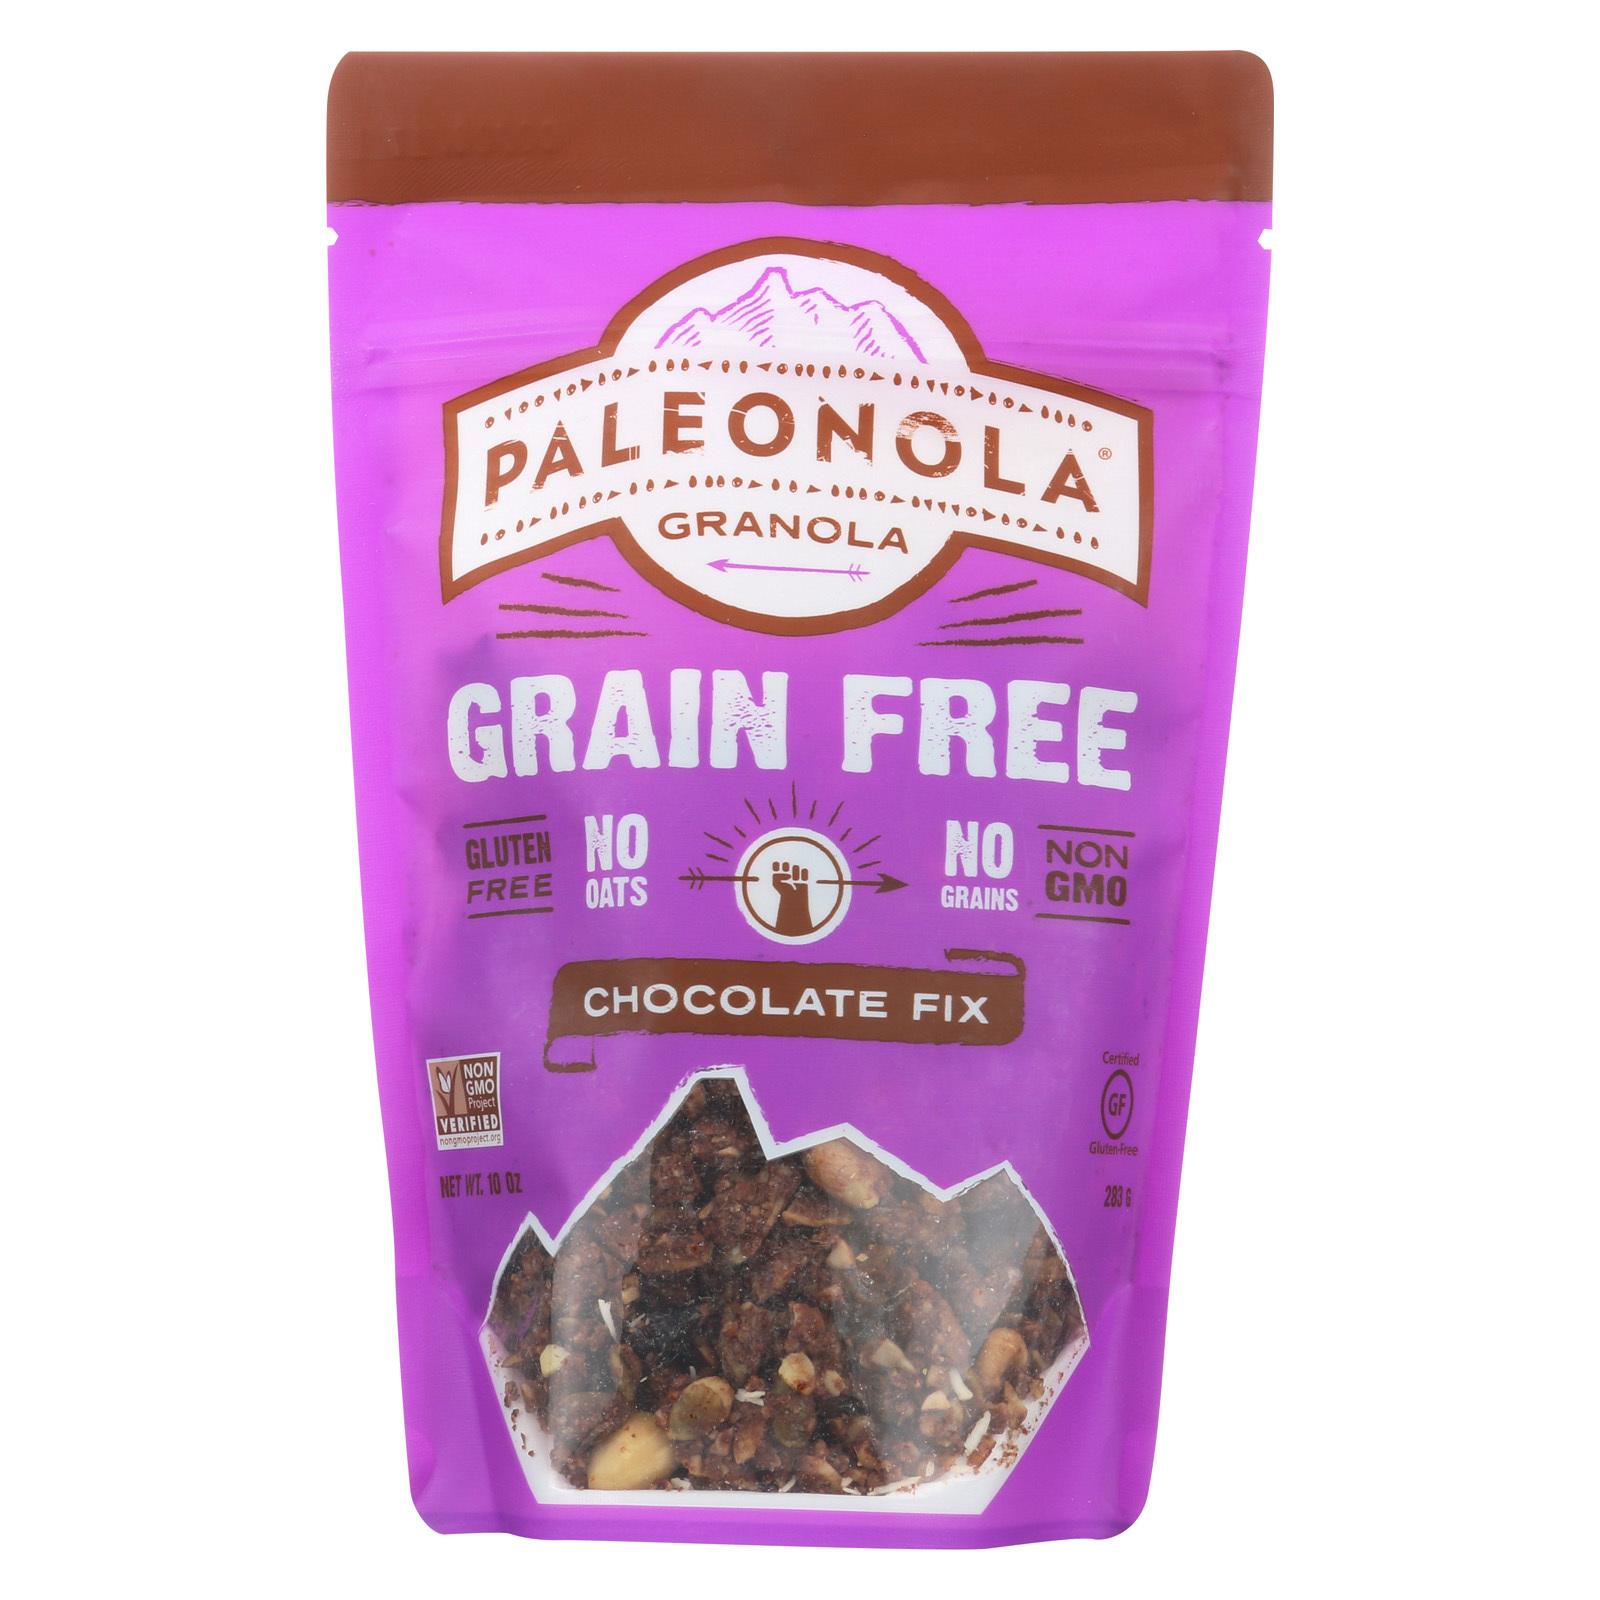 Paleonola Granola - Chocolate Fix - Case of 6 - 10 oz.